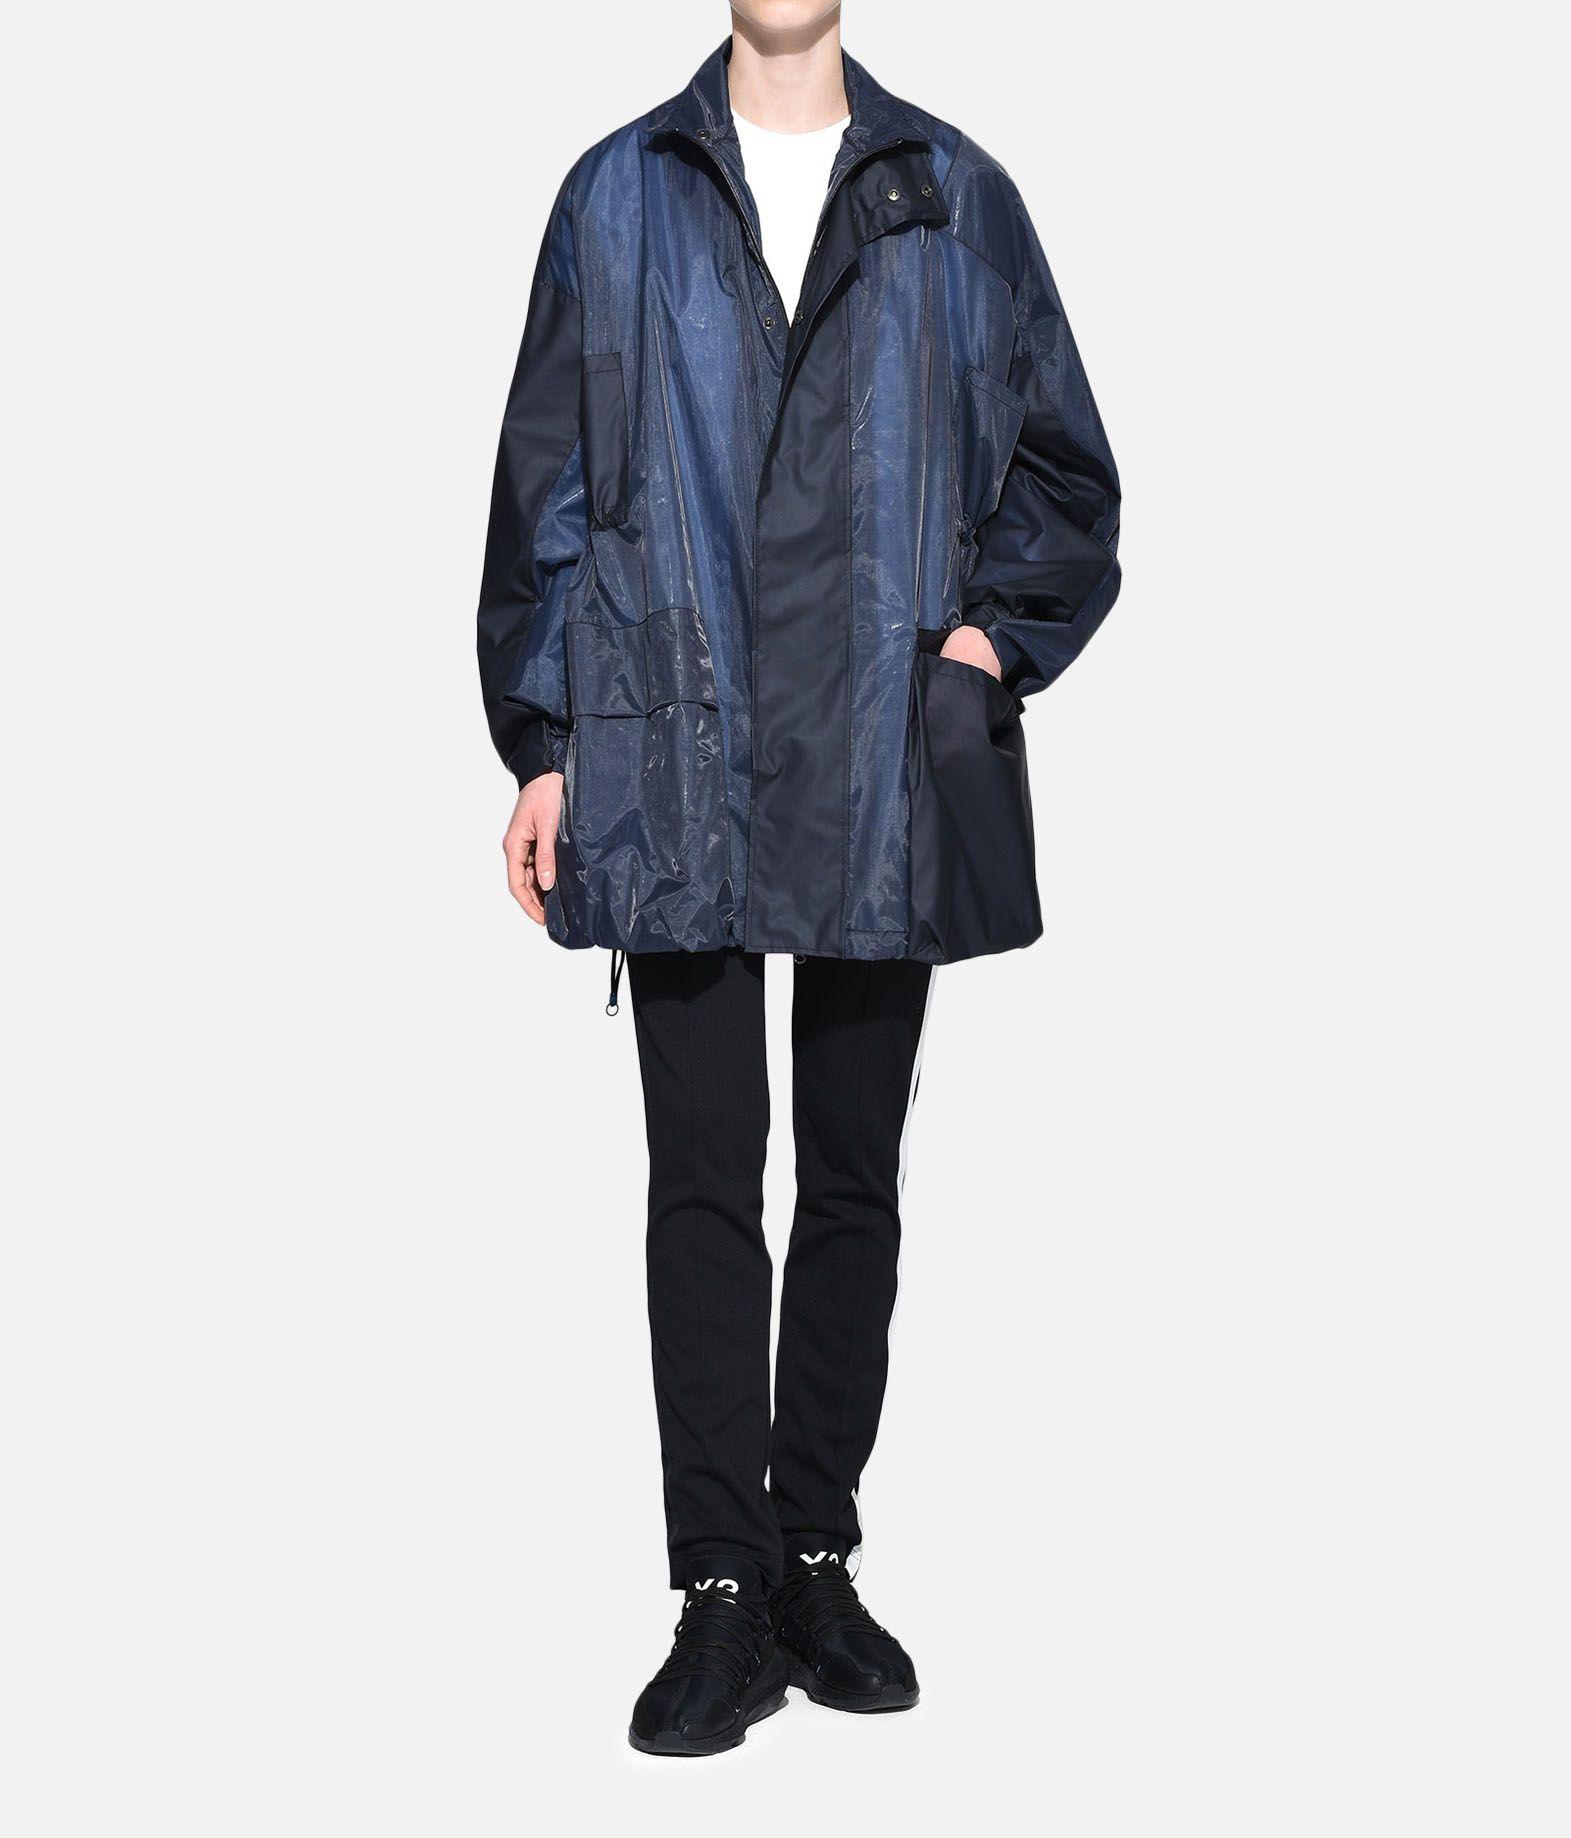 Y-3 Y-3 Patchwork Anorak Jacket Jacket Woman a